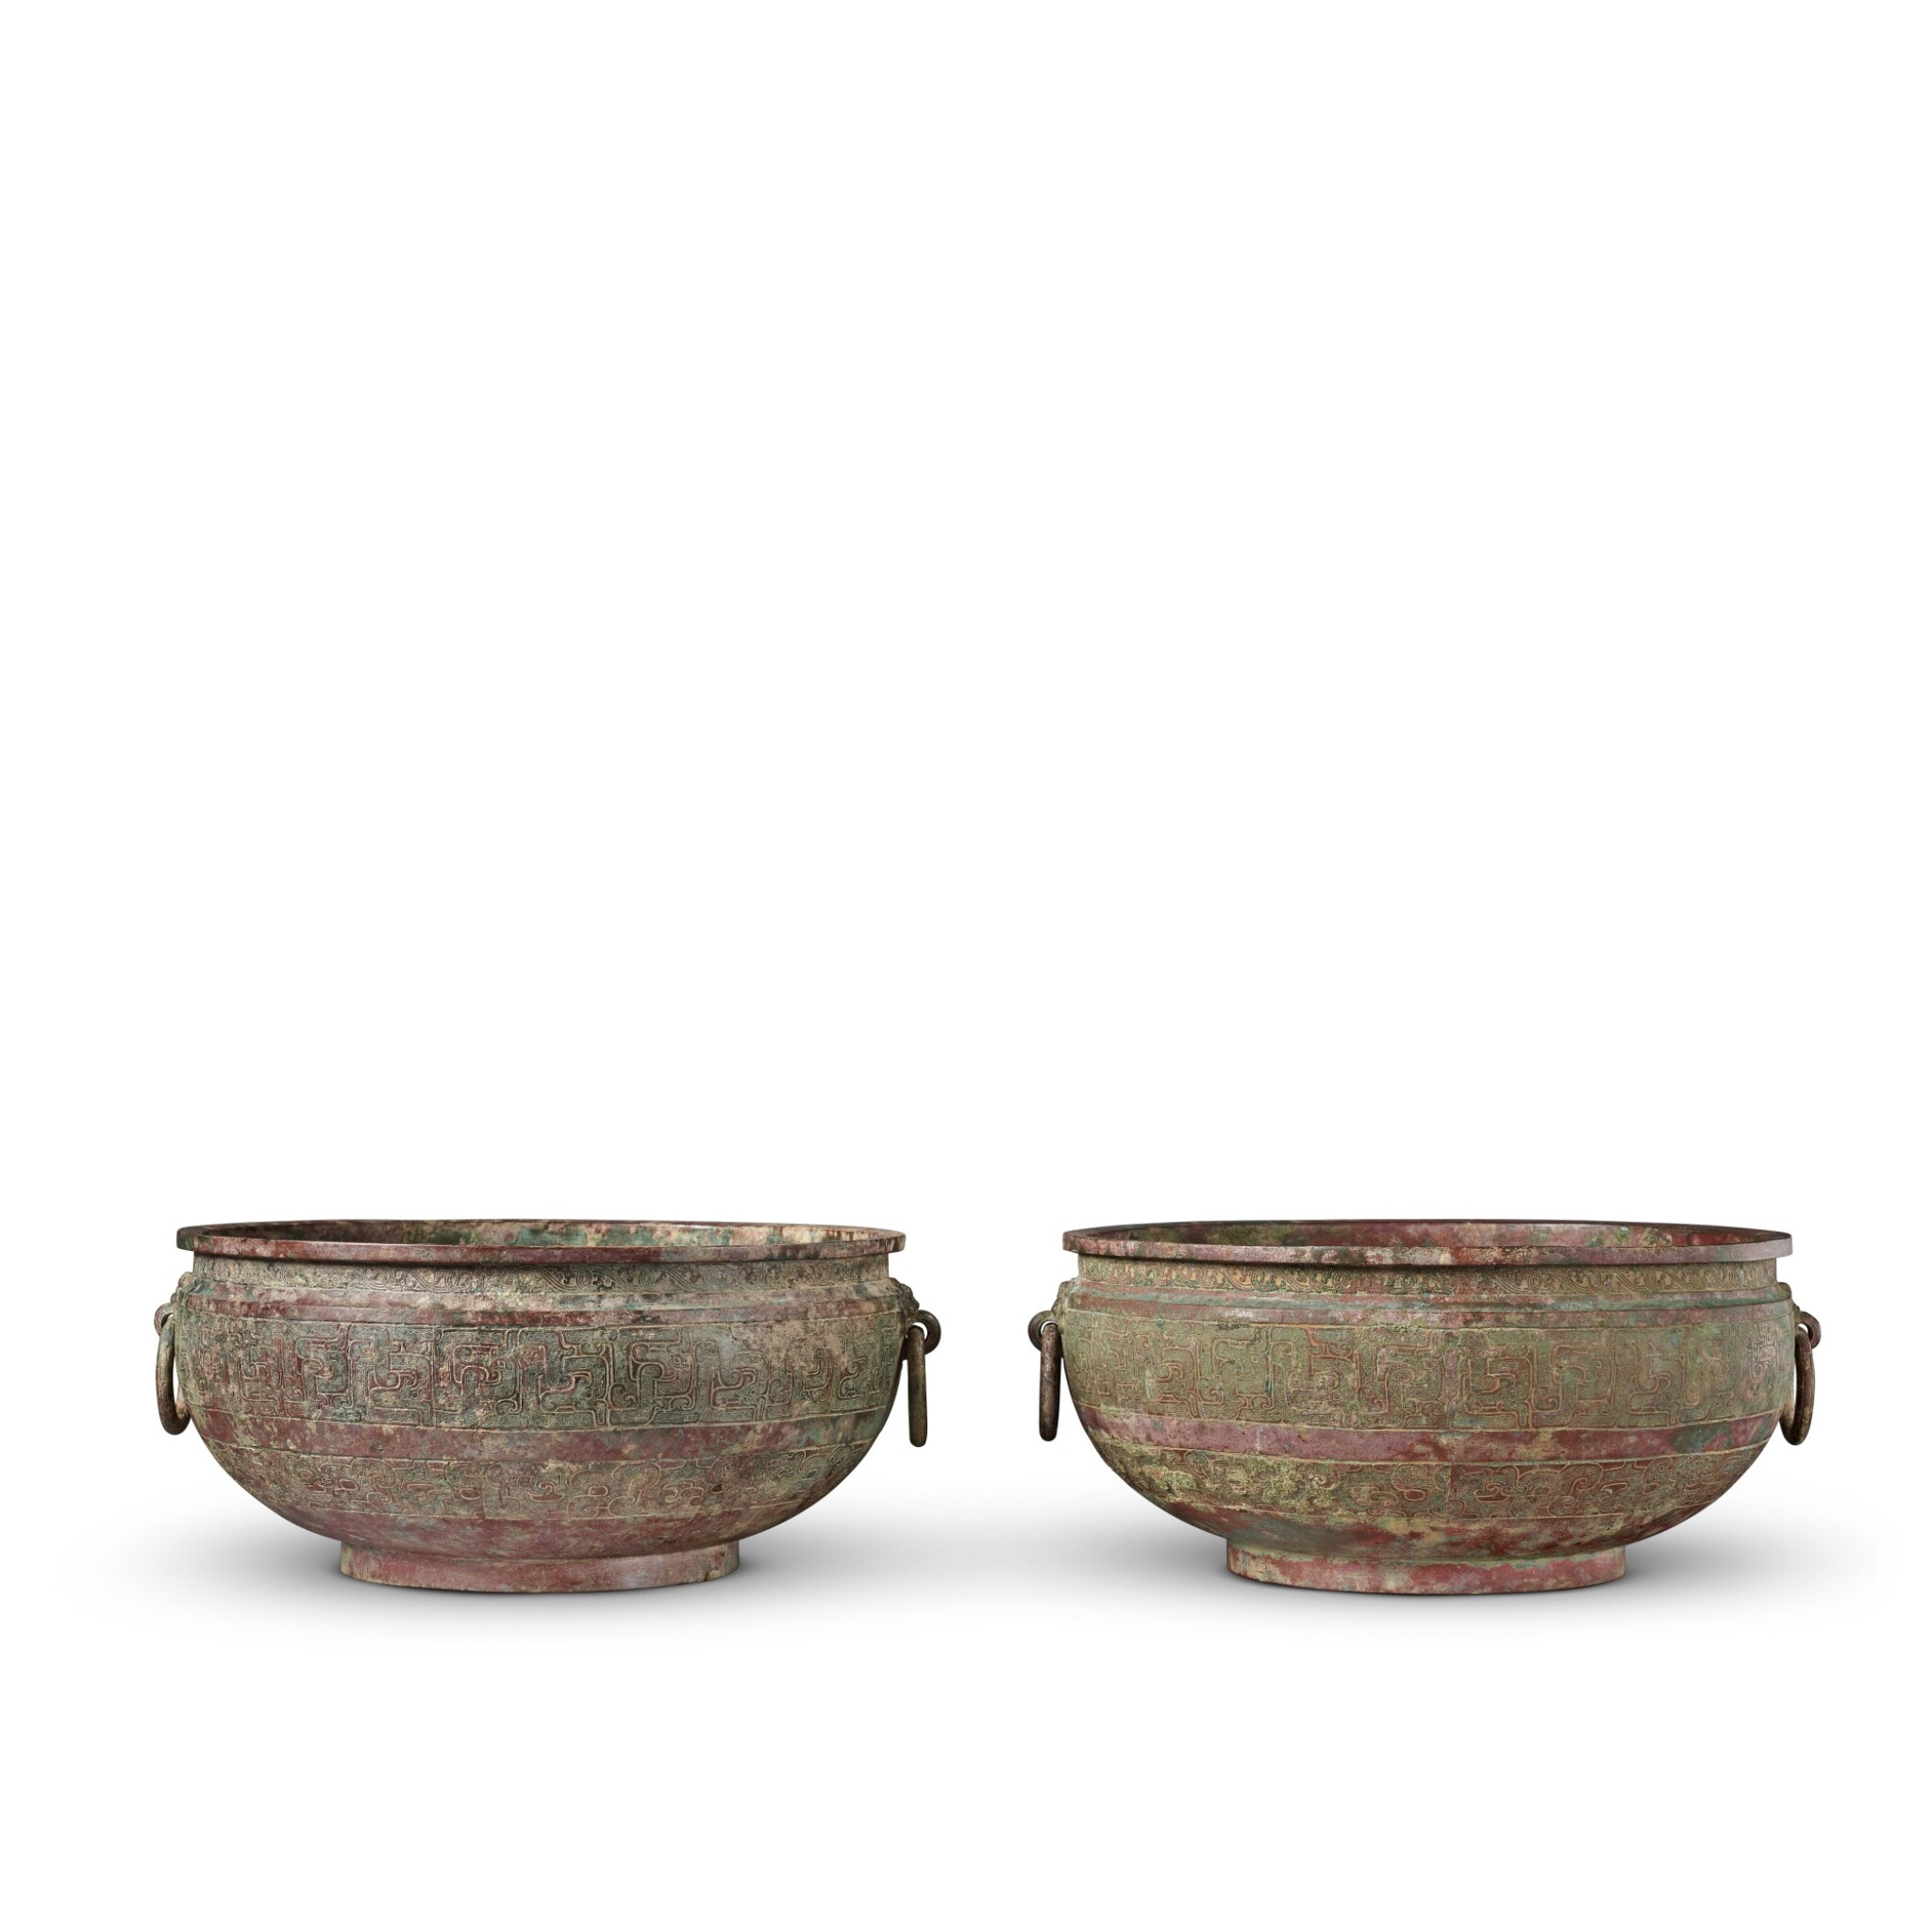 View full screen - View 1 of Lot 16. A pair of archaic bronze water basins (Jian), Eastern Zhou dynasty, late 6th - early 5th century BC   東周 公元前六世紀末至五世紀初 青銅交龍紋鋪首耳鑒一對.